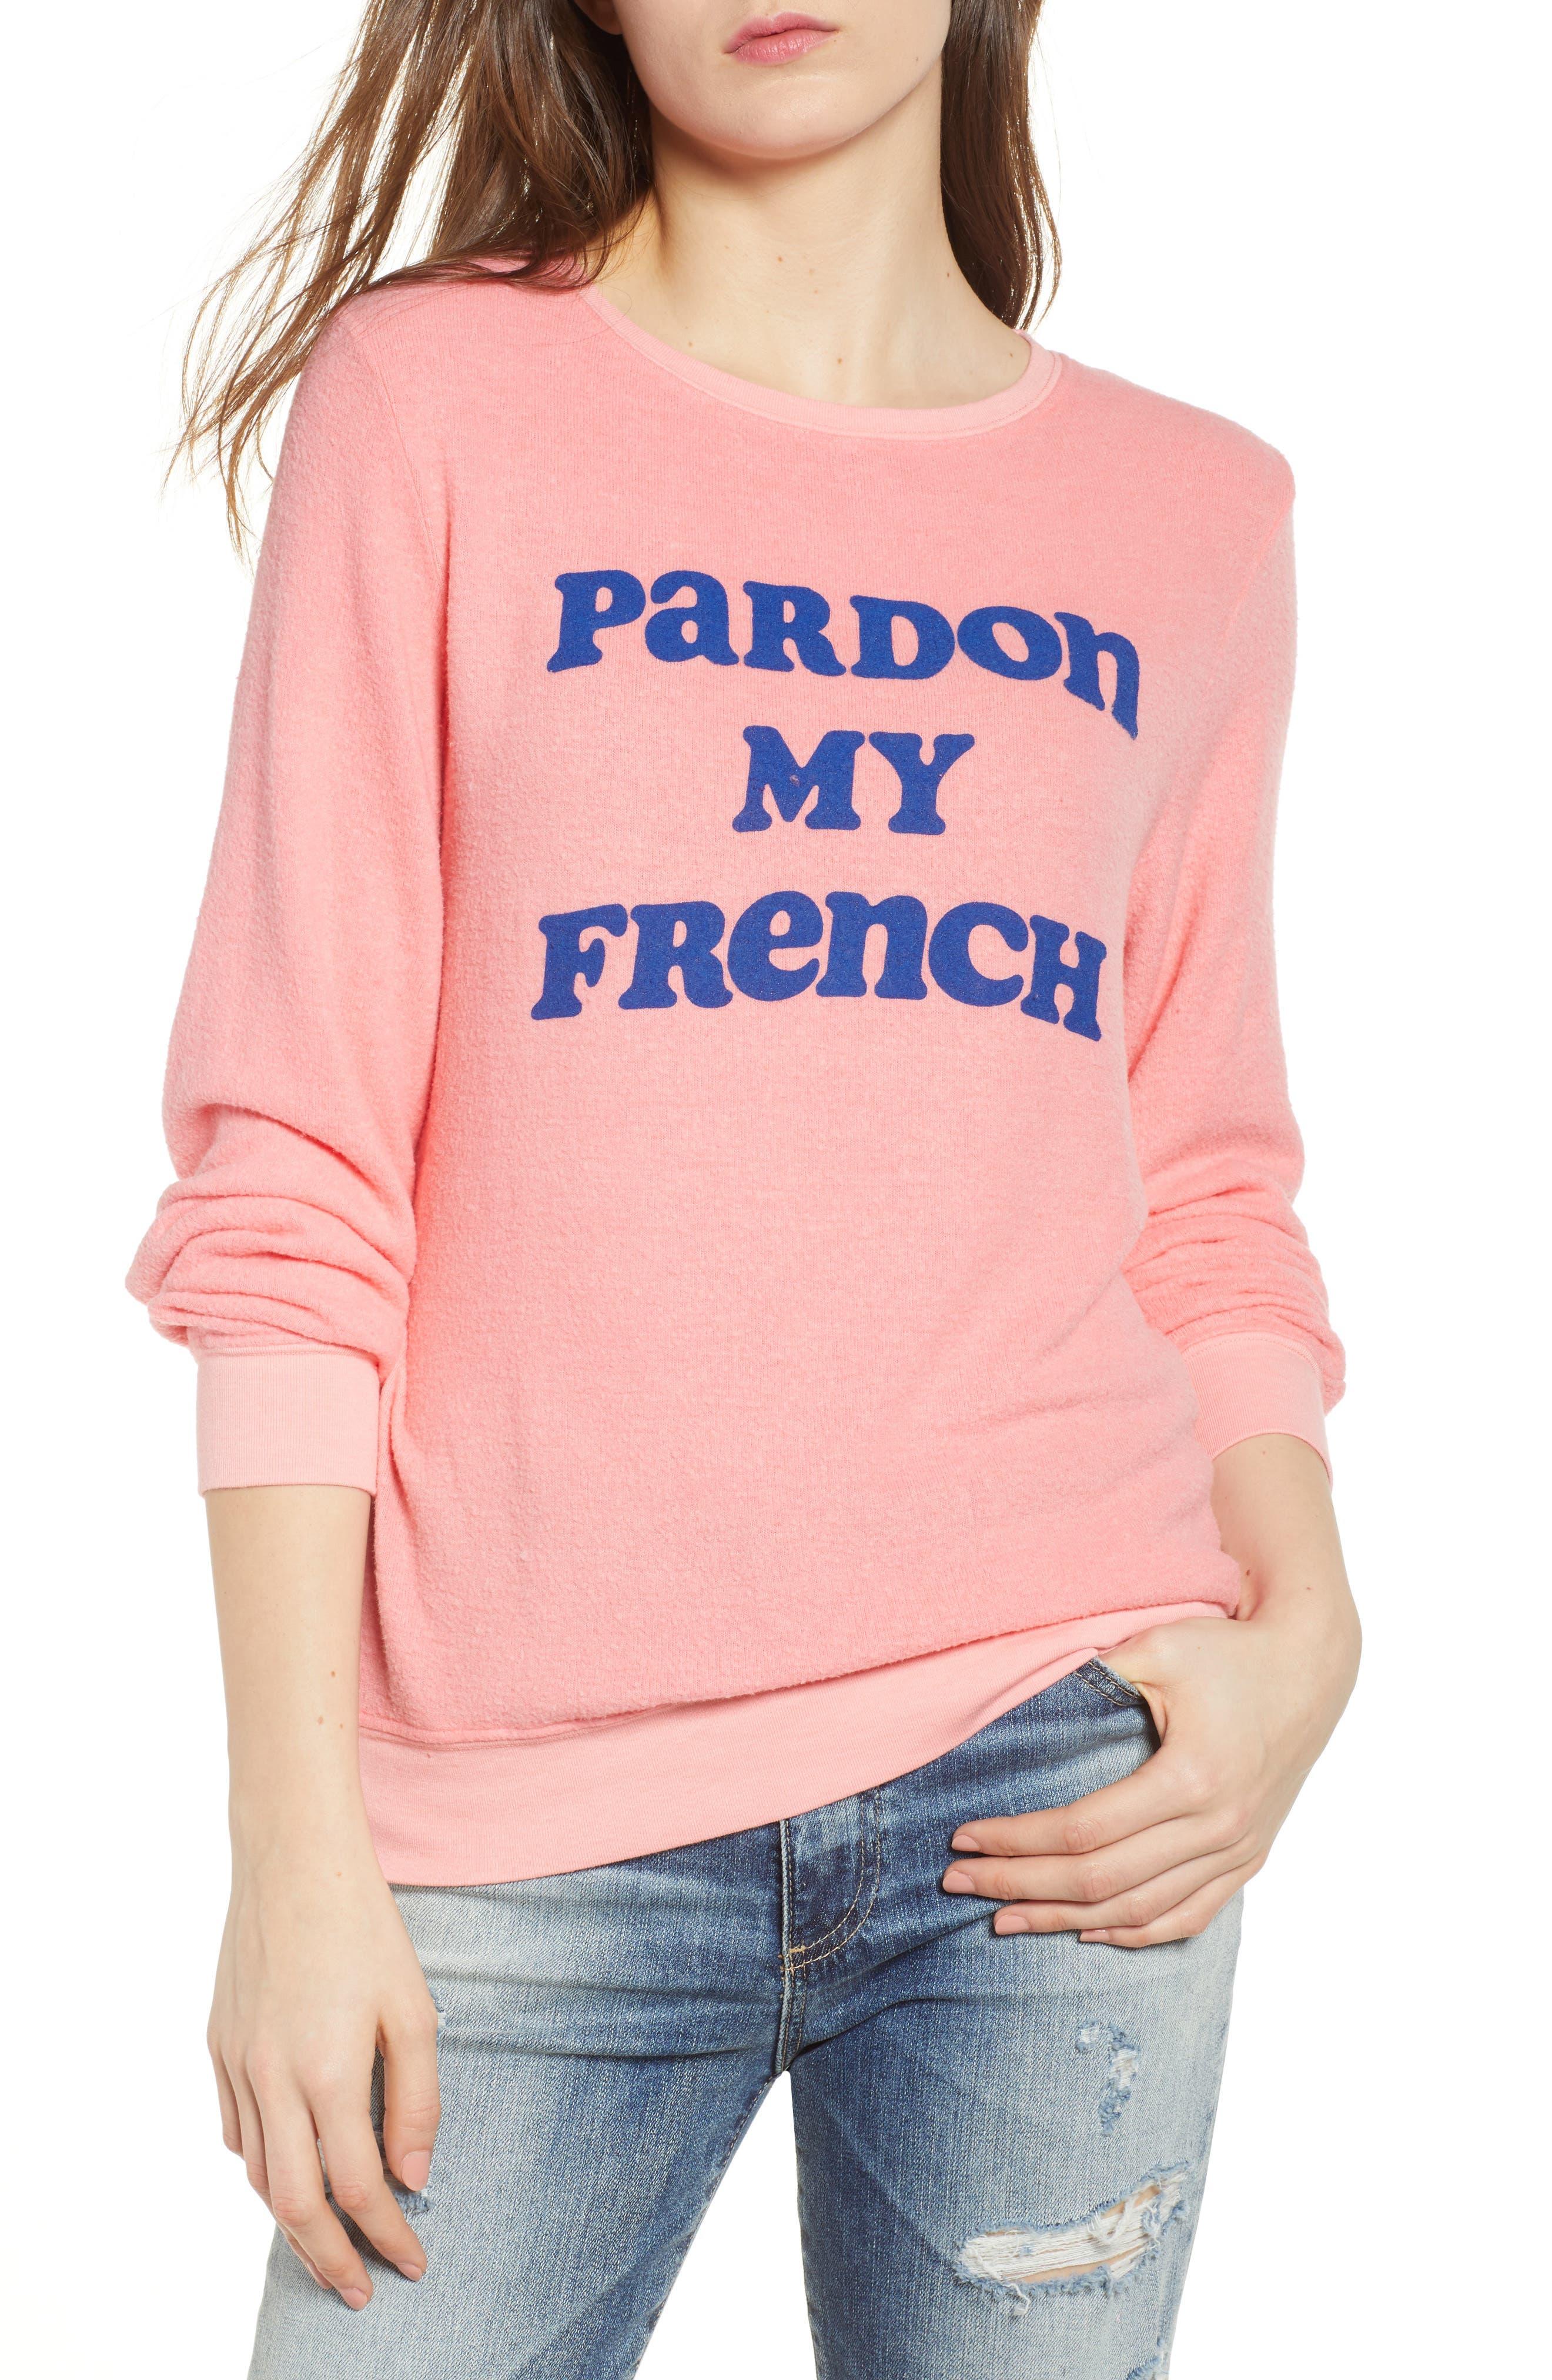 Pardon My French Sweatshirt,                         Main,                         color, 950